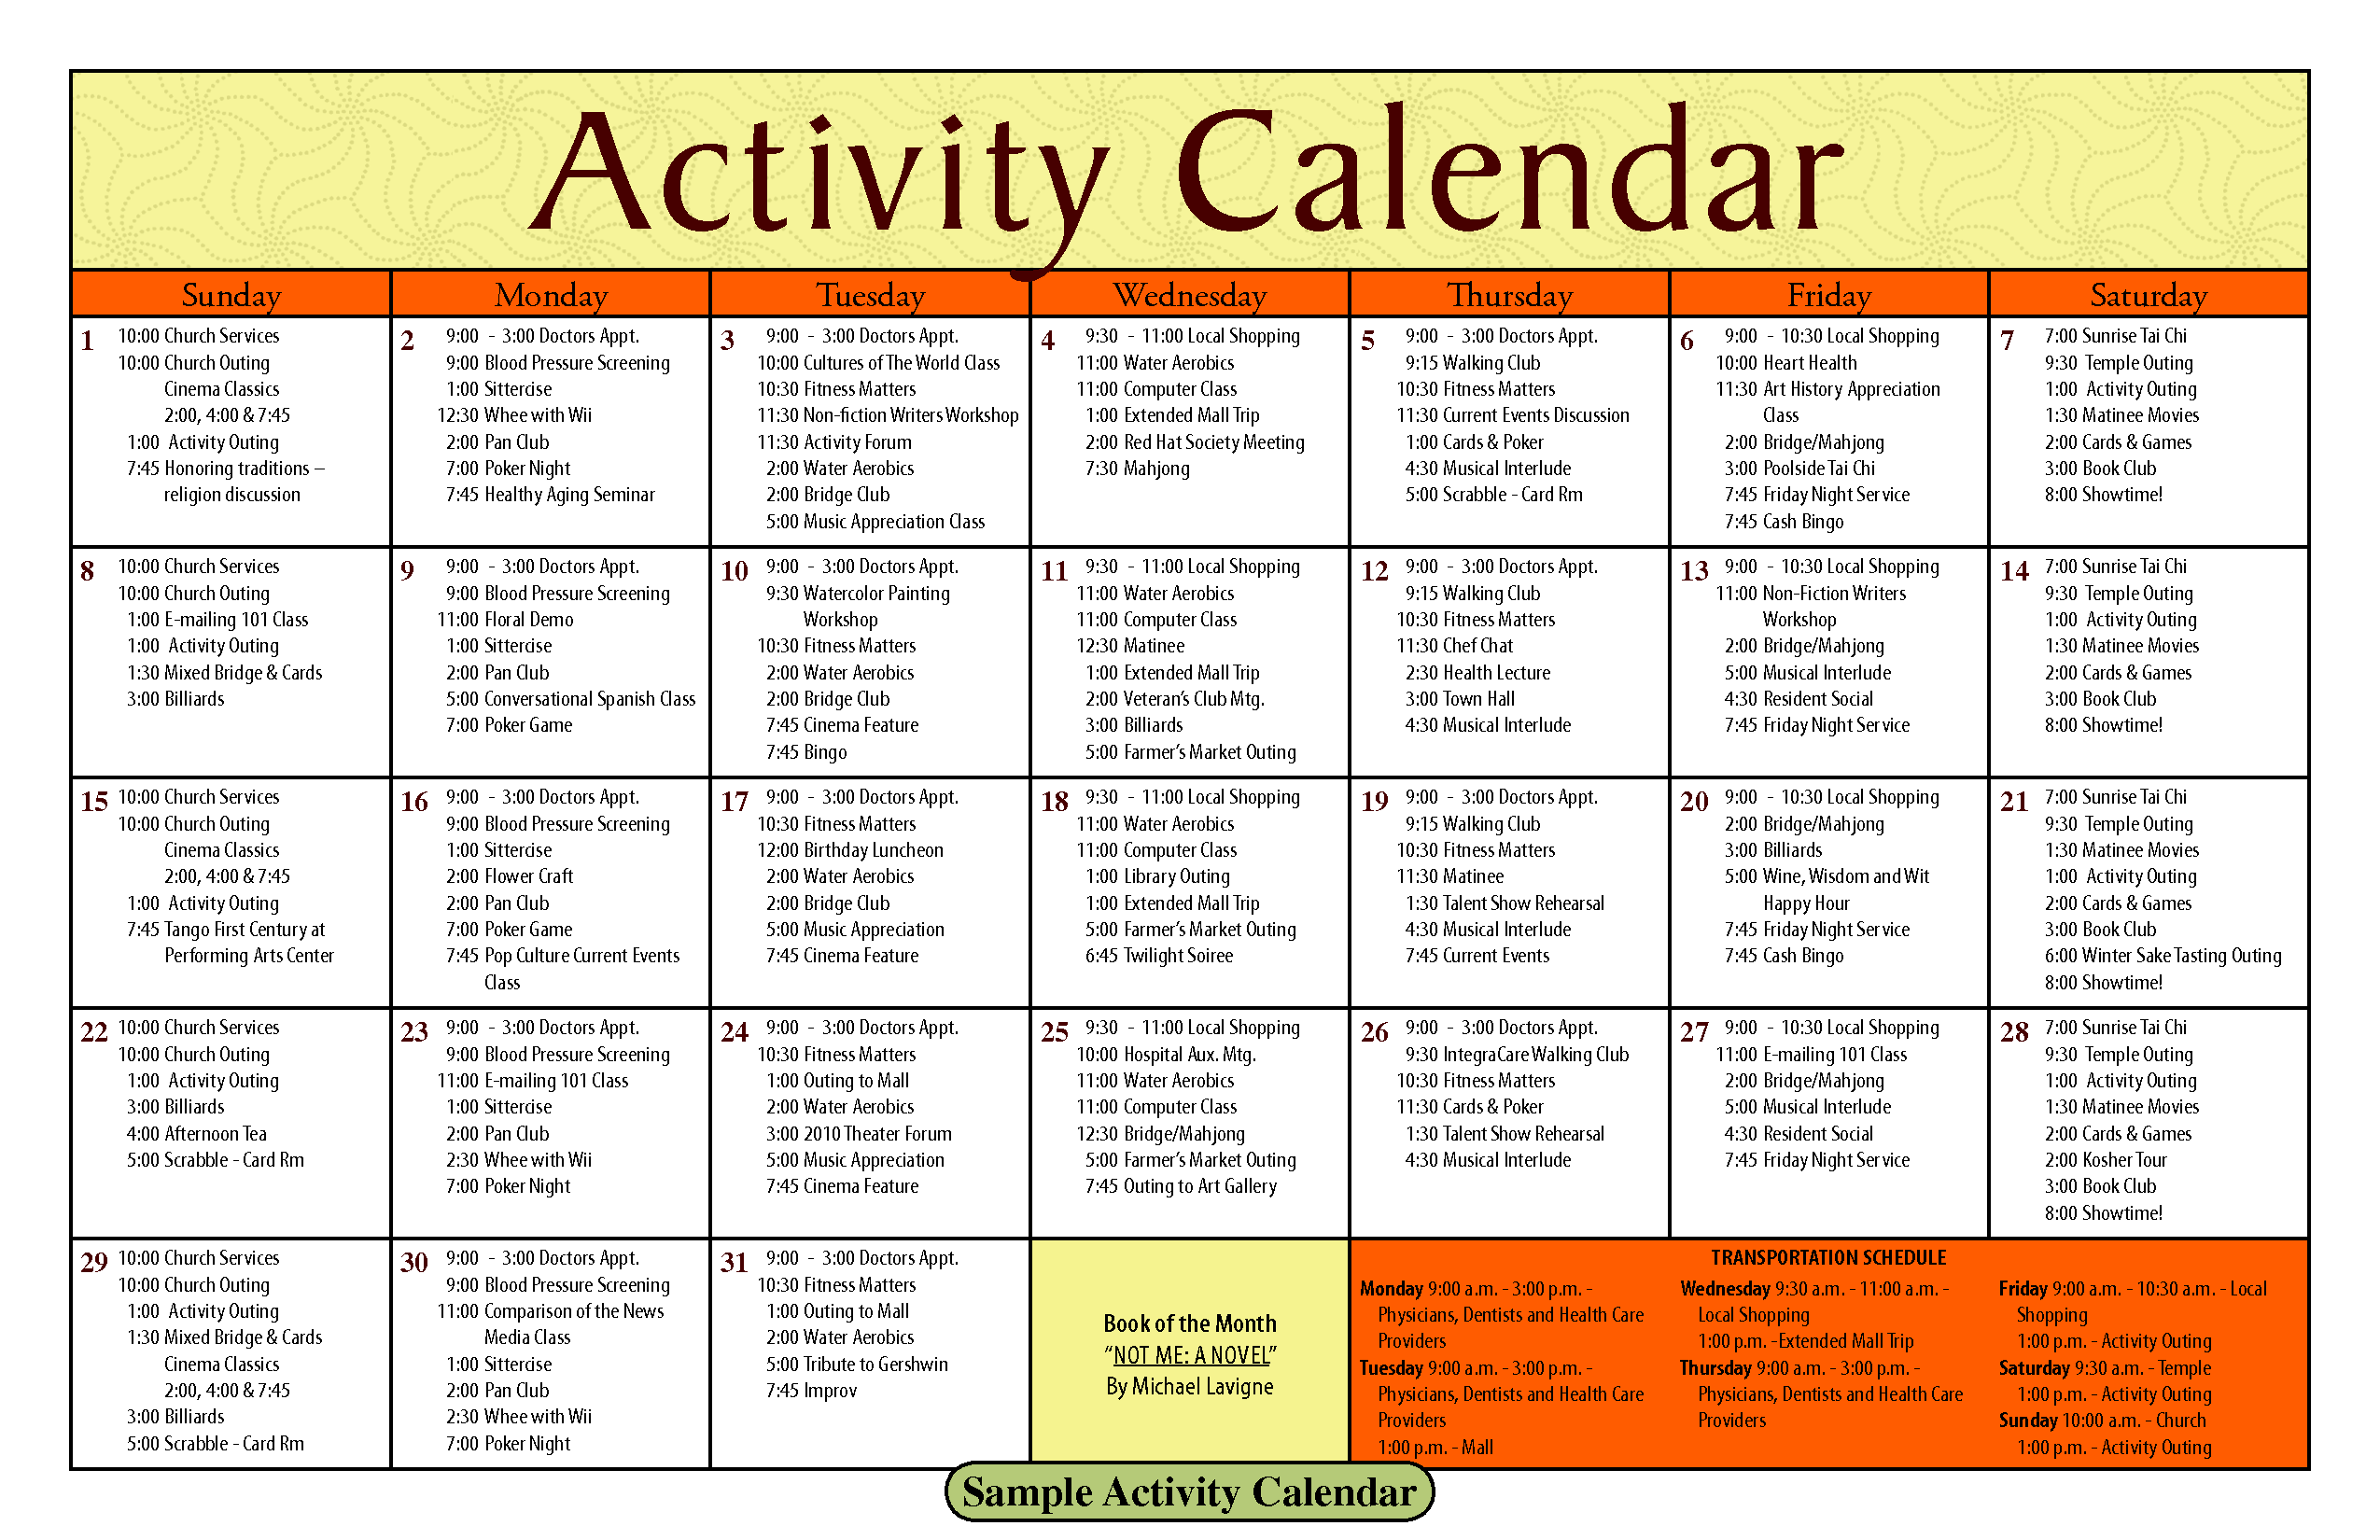 Image Result For Sample Calendar For Senior Activities